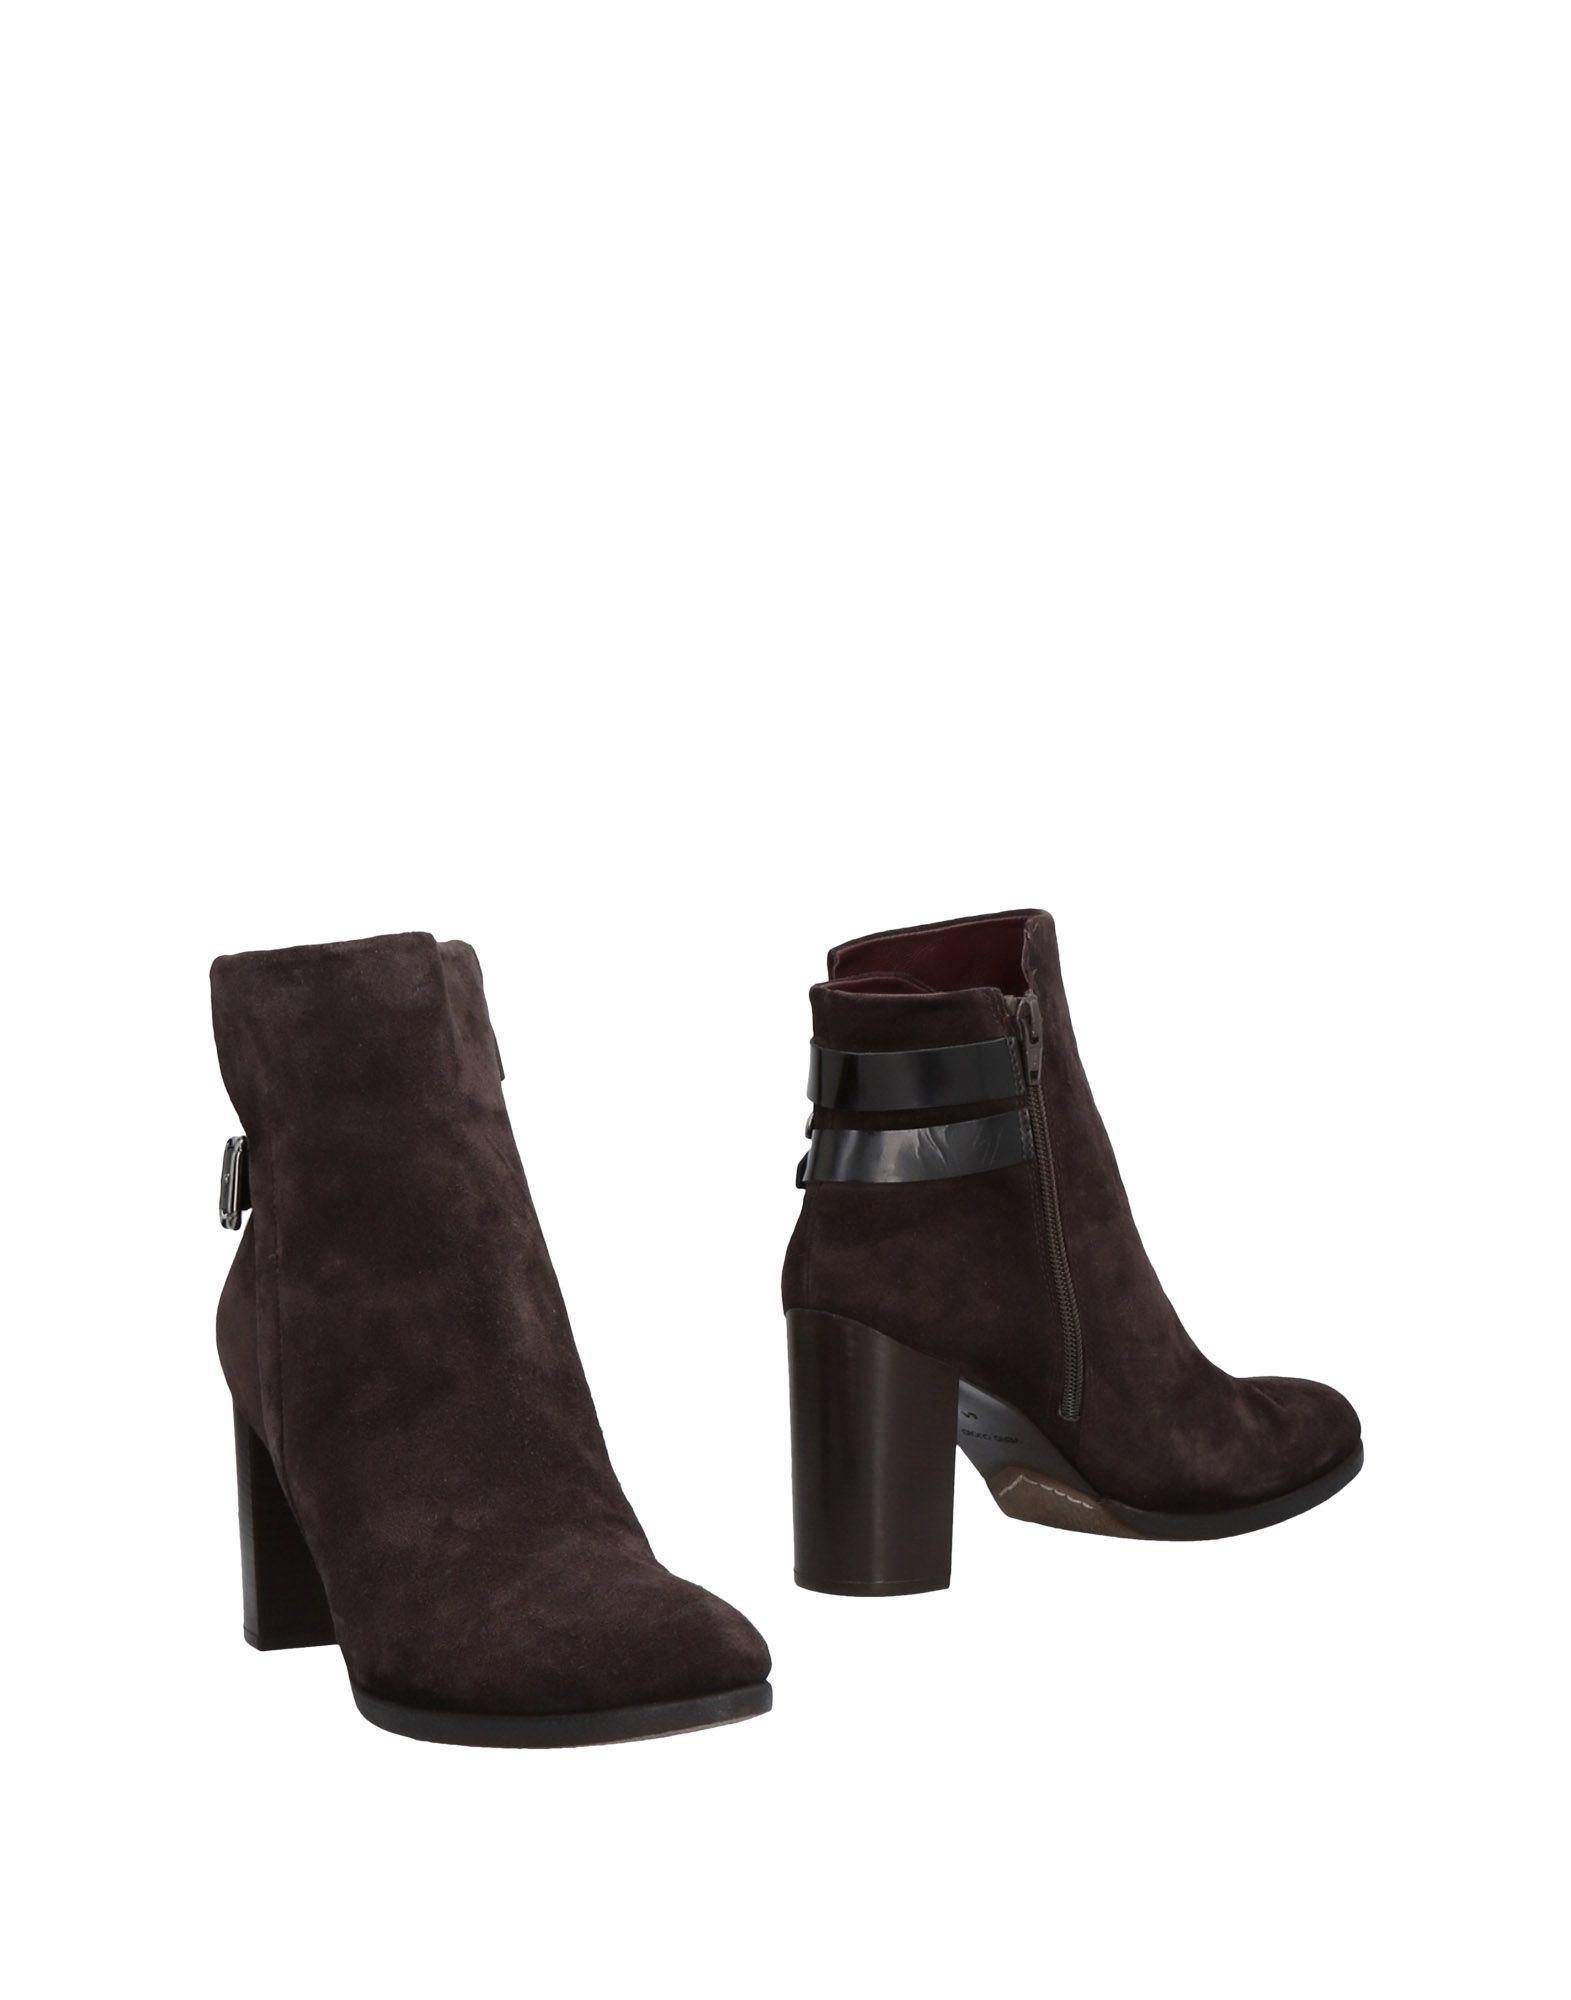 Silvia 11460009AC Carasi Stiefelette Damen  11460009AC Silvia Gute Qualität beliebte Schuhe 41ade7